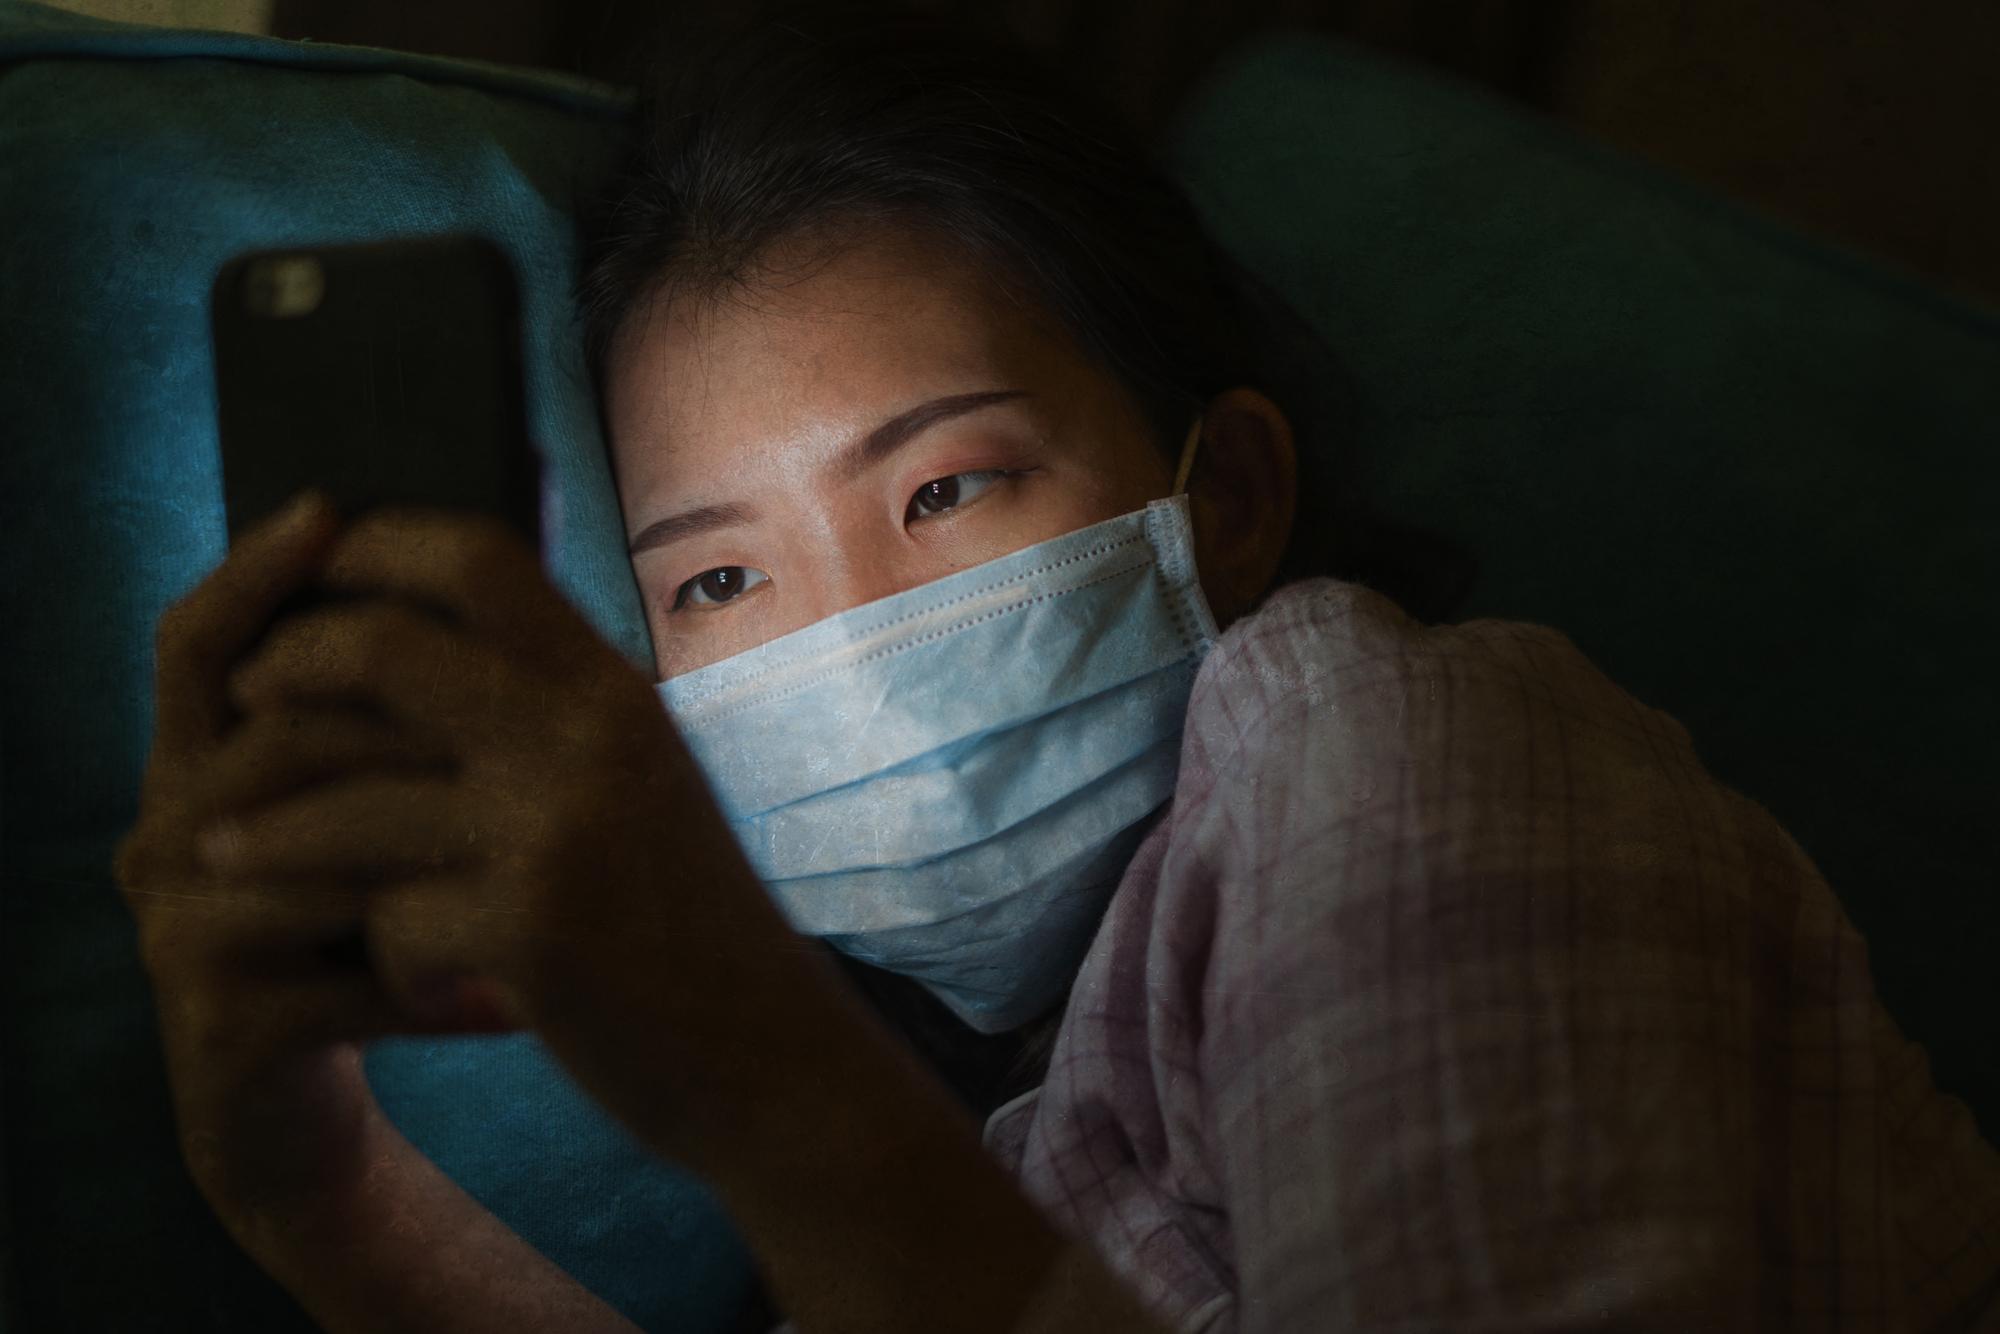 stress management covid covid-19 pandemic corona virus